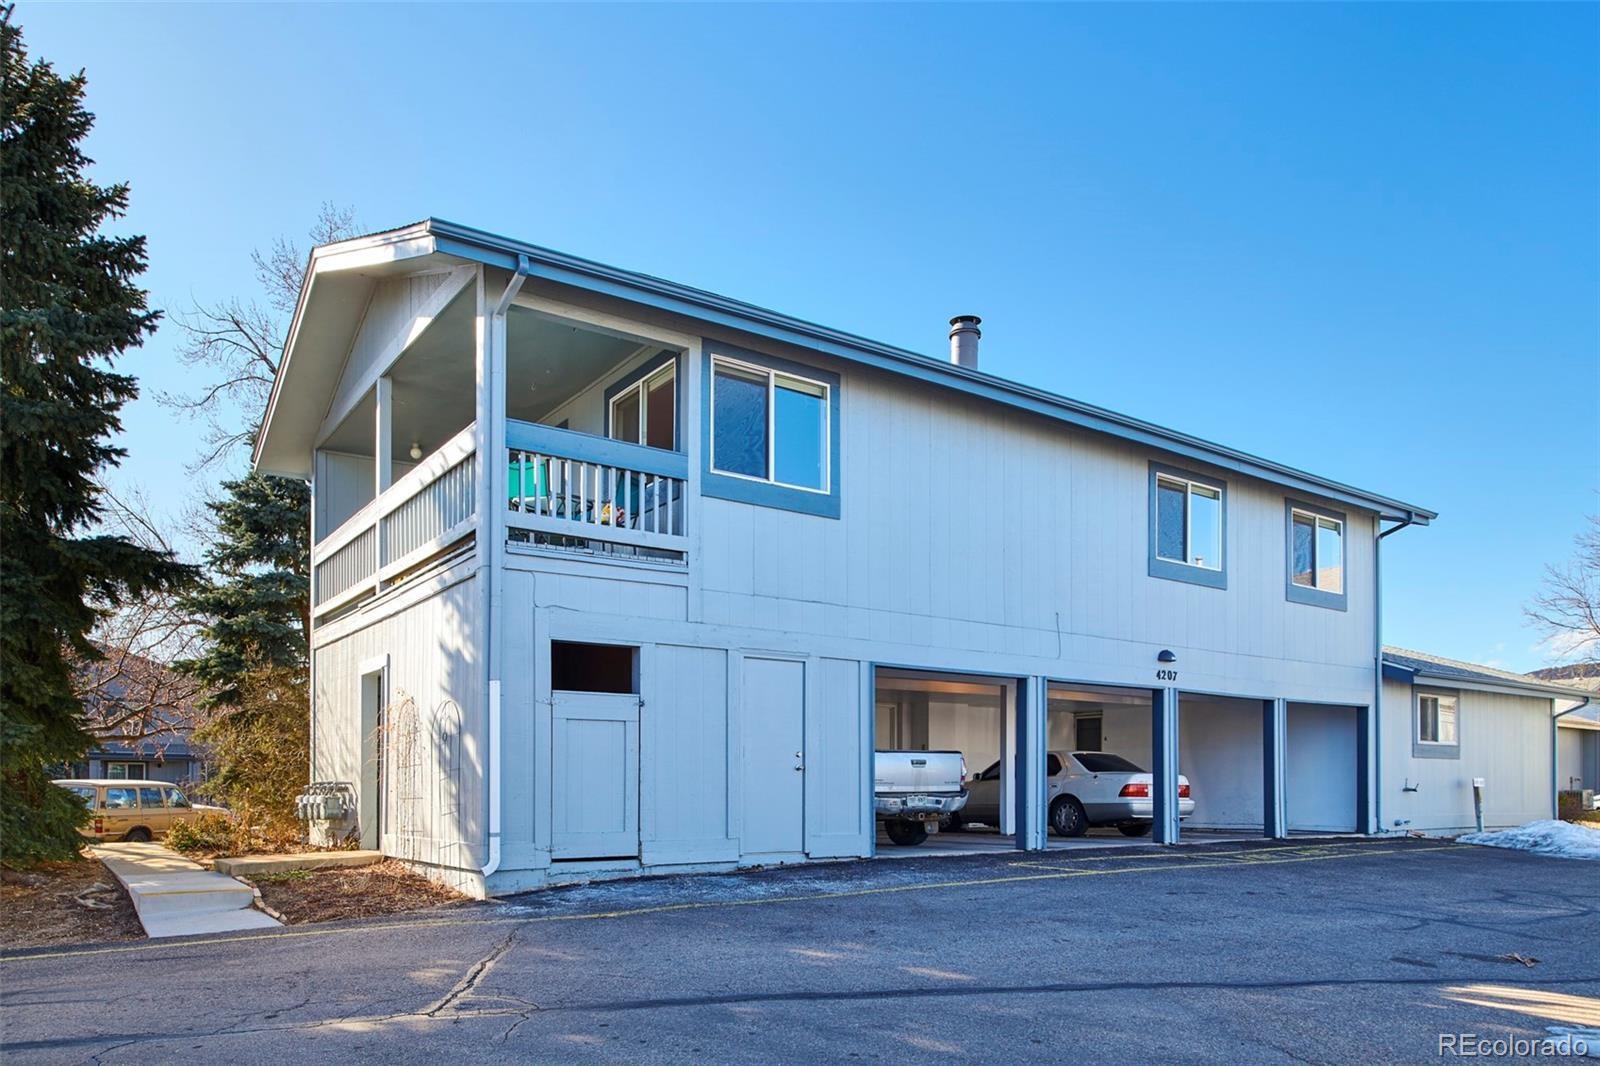 MLS# 4164486 - 2 - 4207 Monroe Drive #D, Boulder, CO 80303